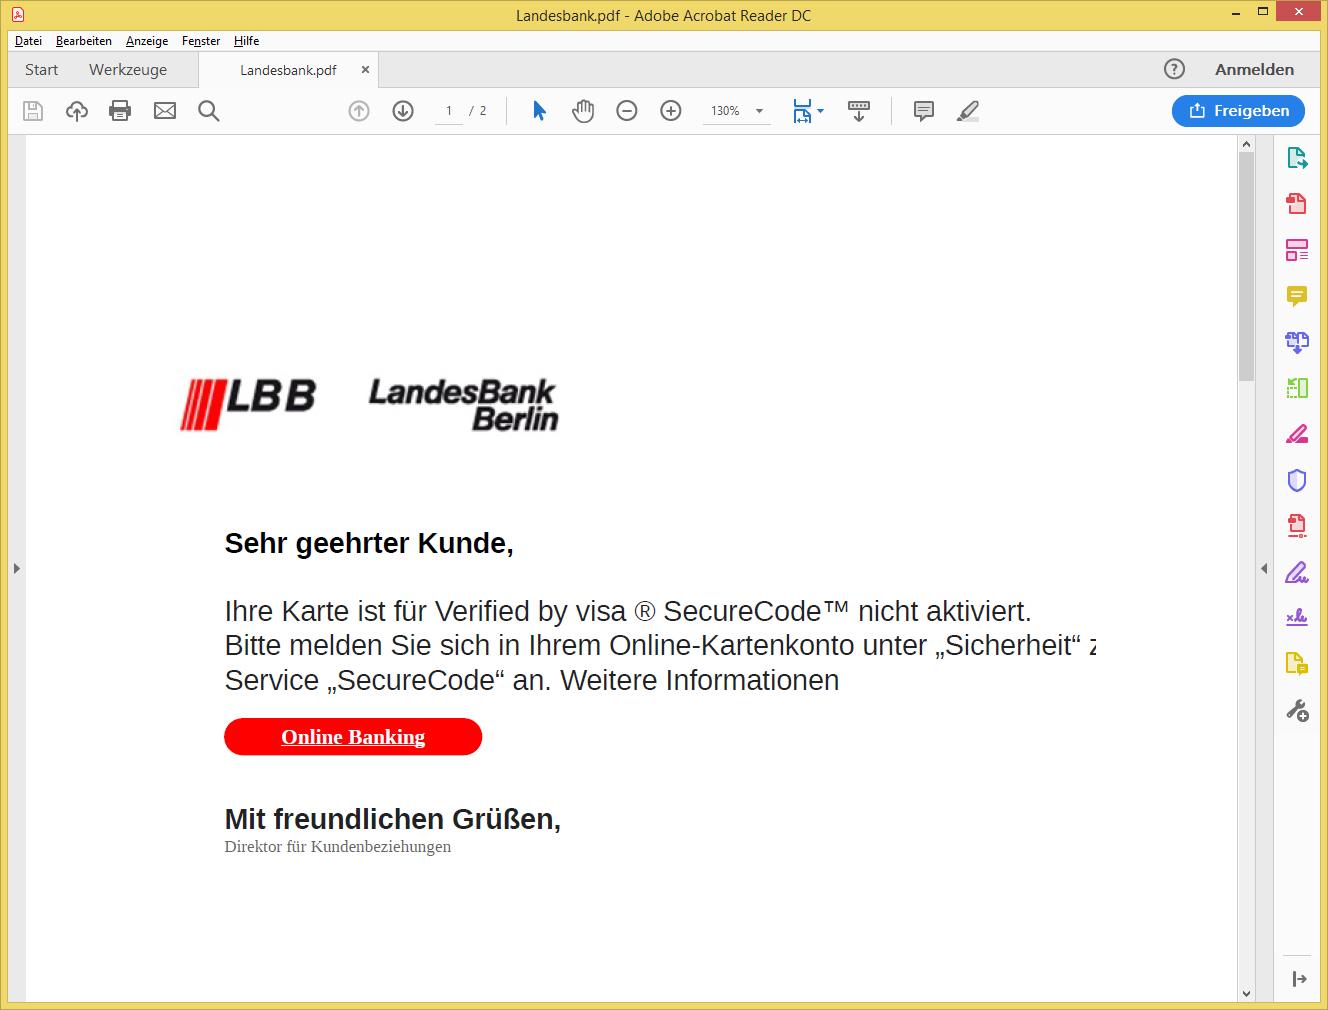 Landesbank berlin amazon kreditkarte geld abheben